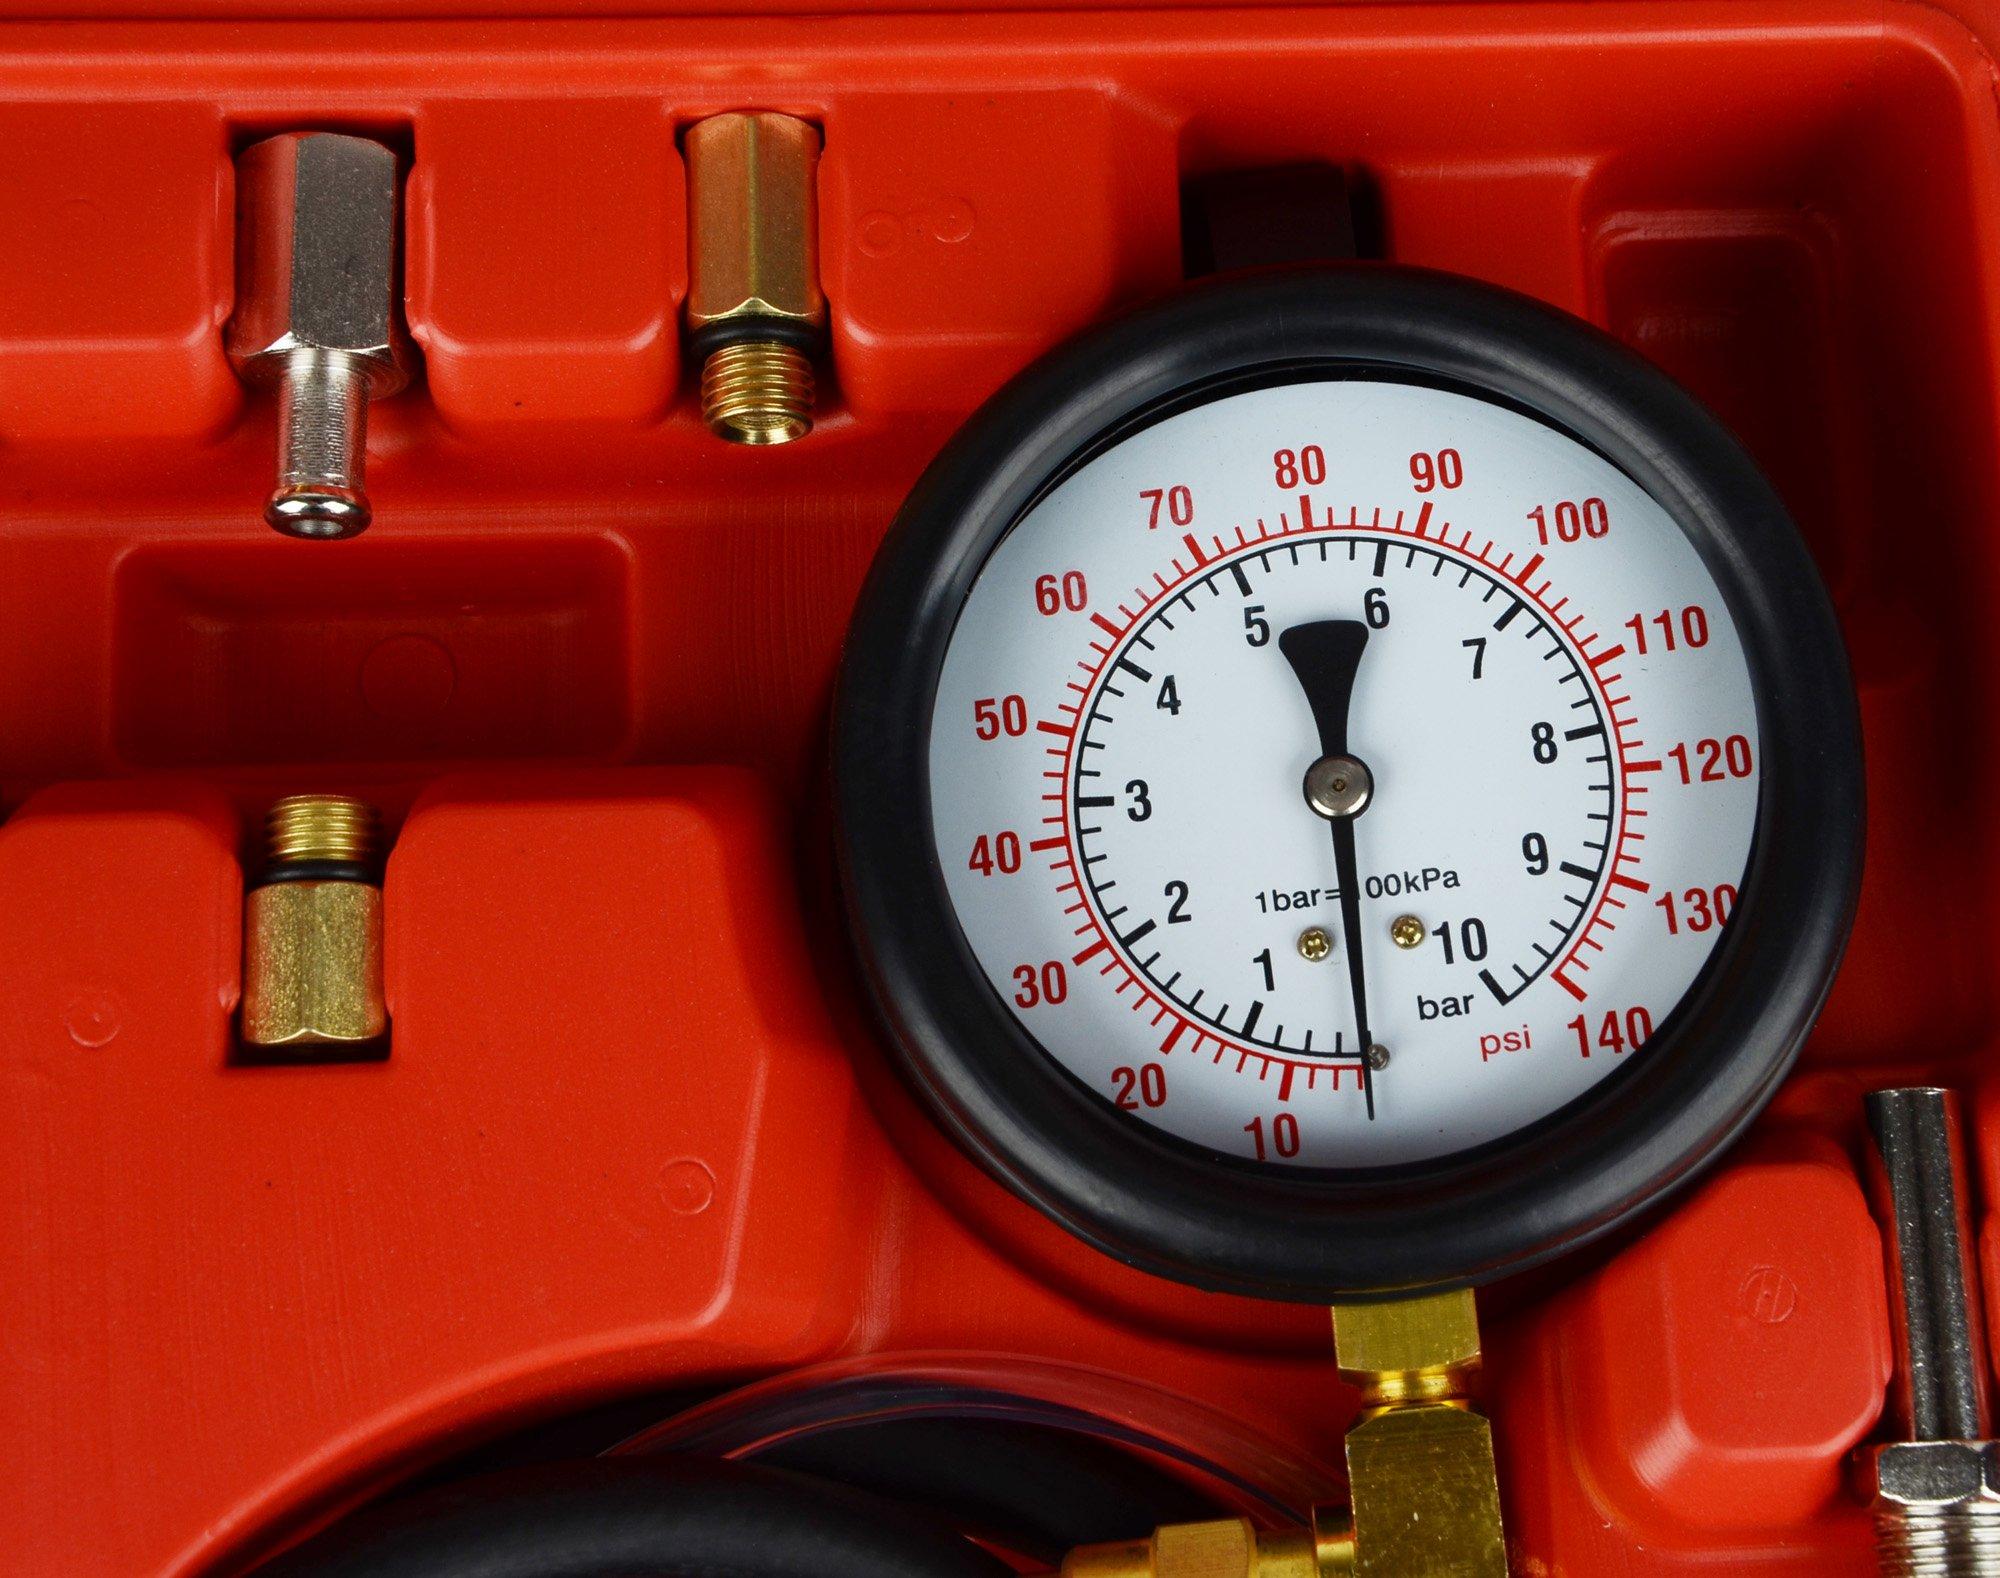 DA YUAN 0-140 PSI Fuel Injection Pressure Gauge Tester Tool Kit by DA YUAN (Image #4)